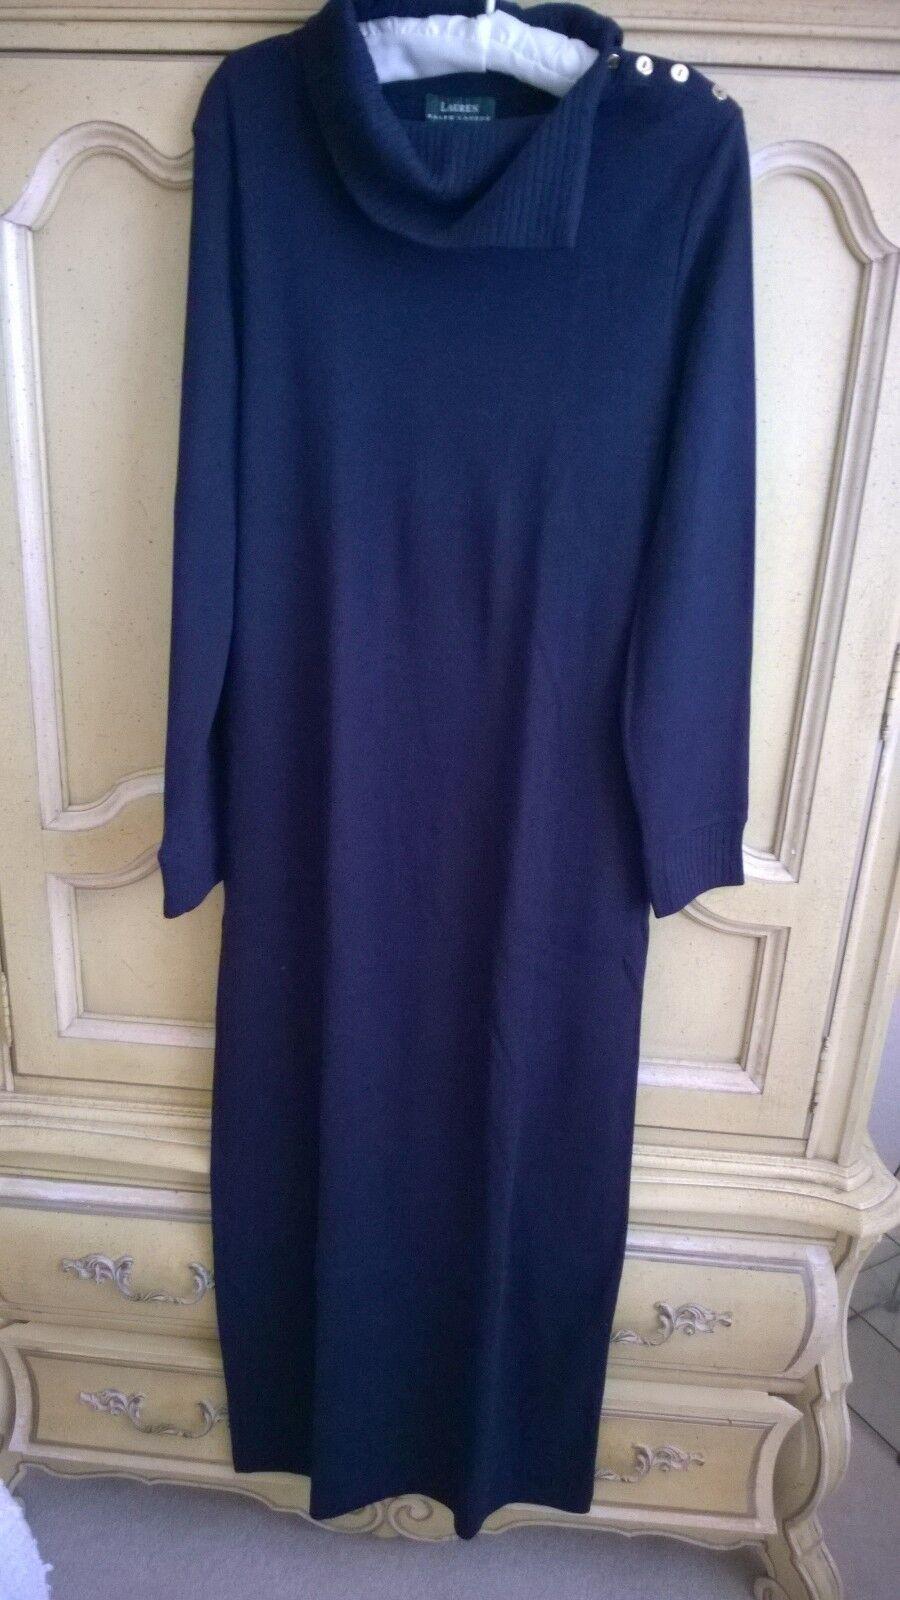 Vintage Lauren Navy bluee Cotton Knit Sweater Dress  M